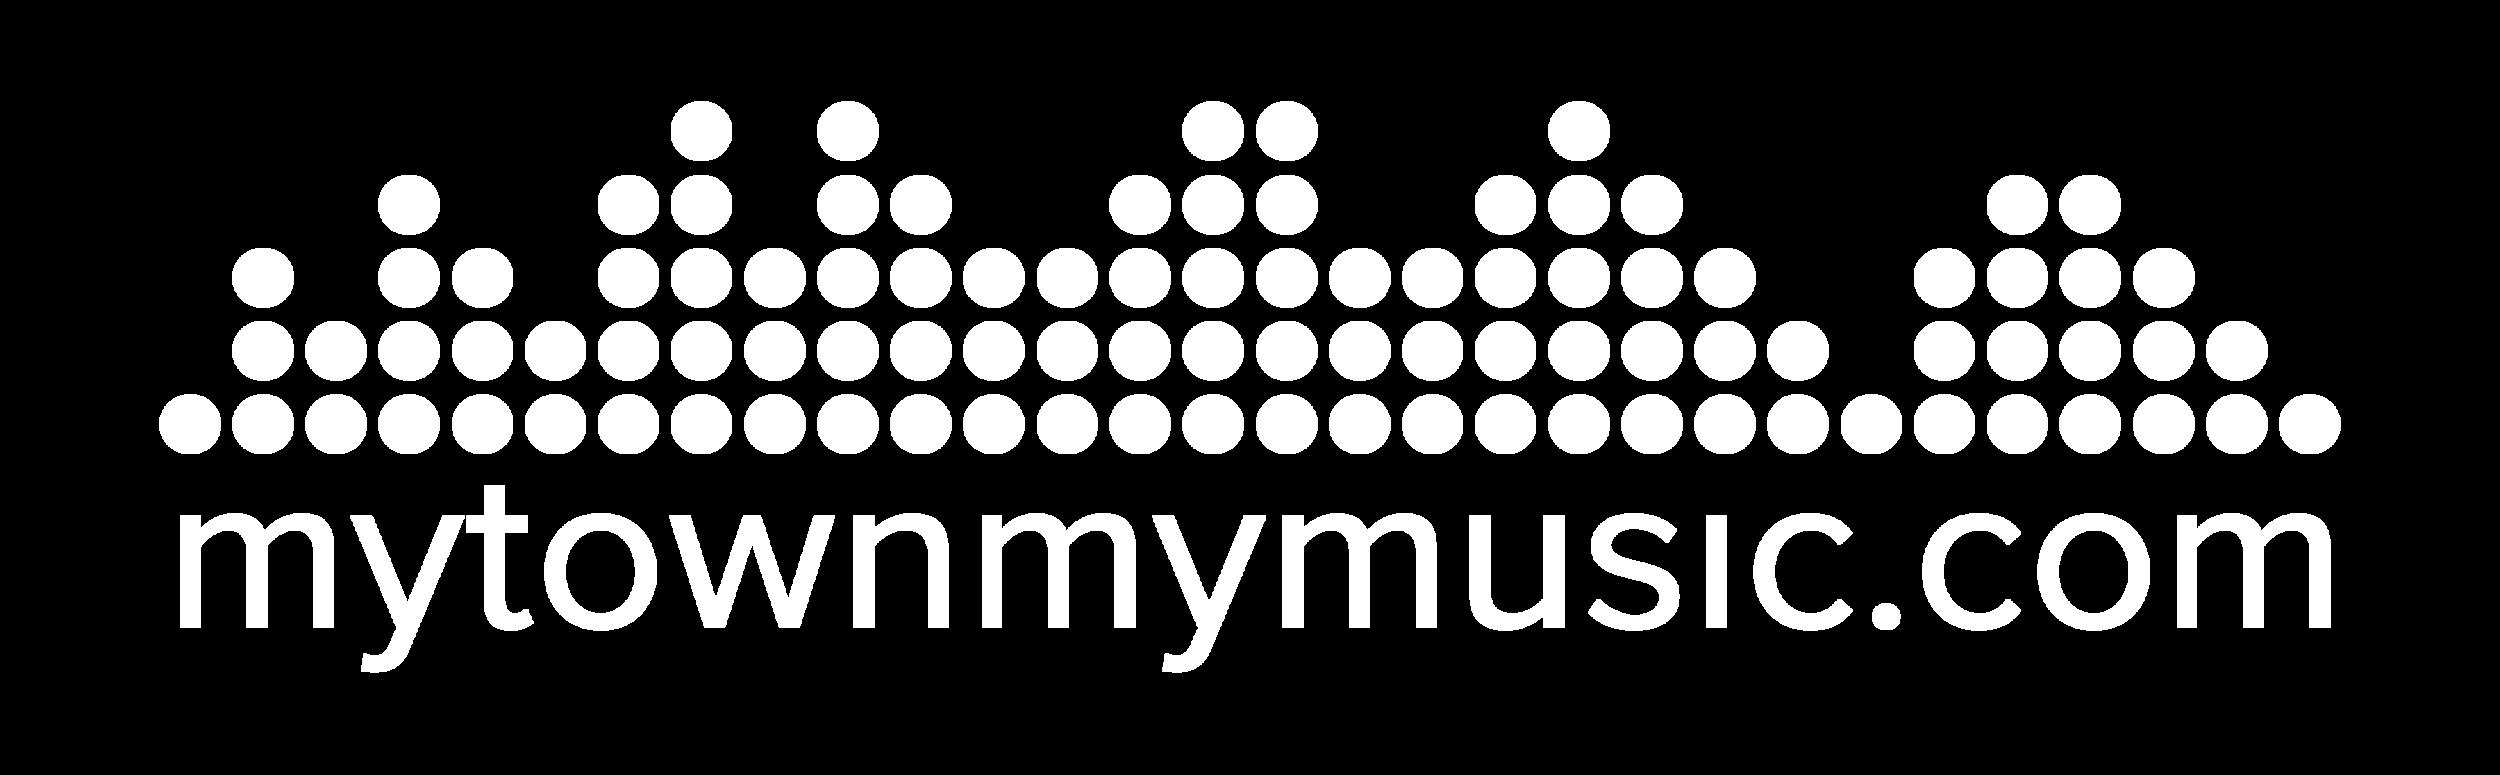 mytownmymusic-logo-BIG.png